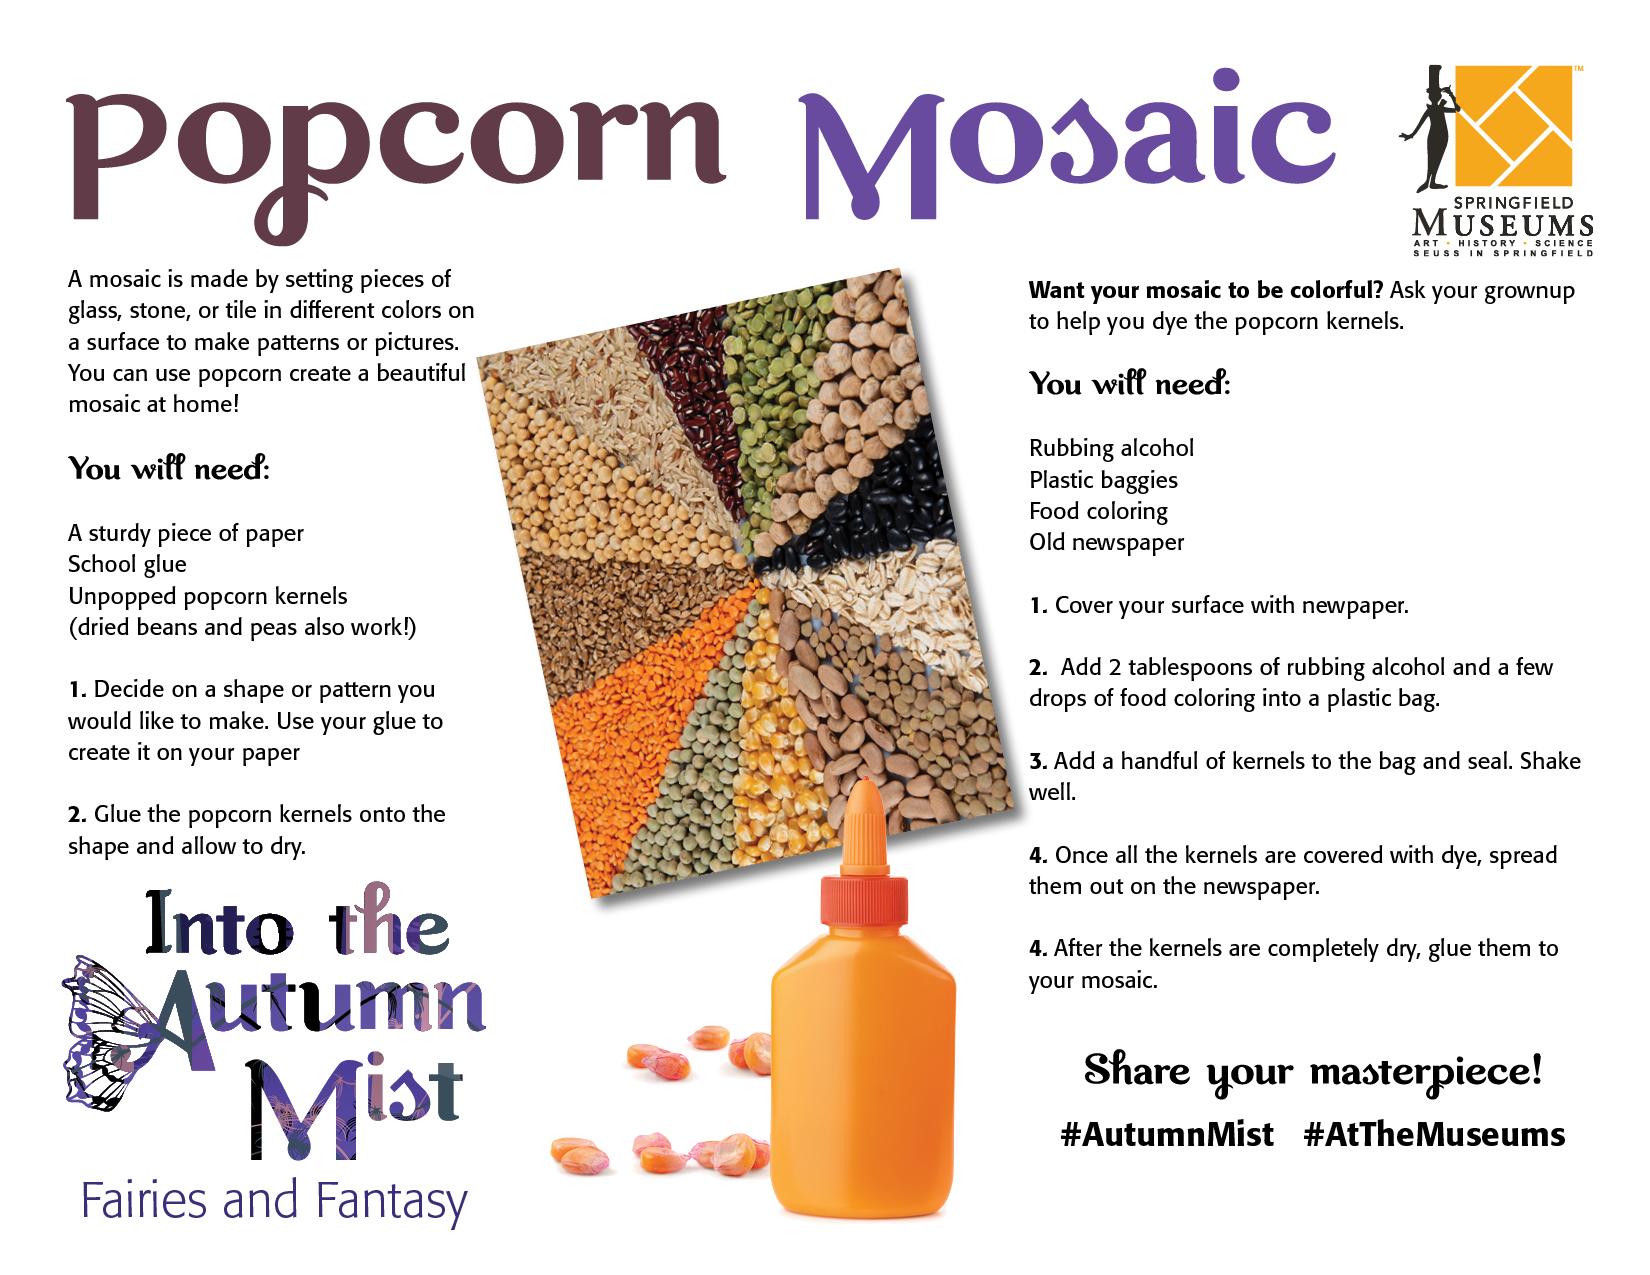 Popcorn Mosaic Instructions